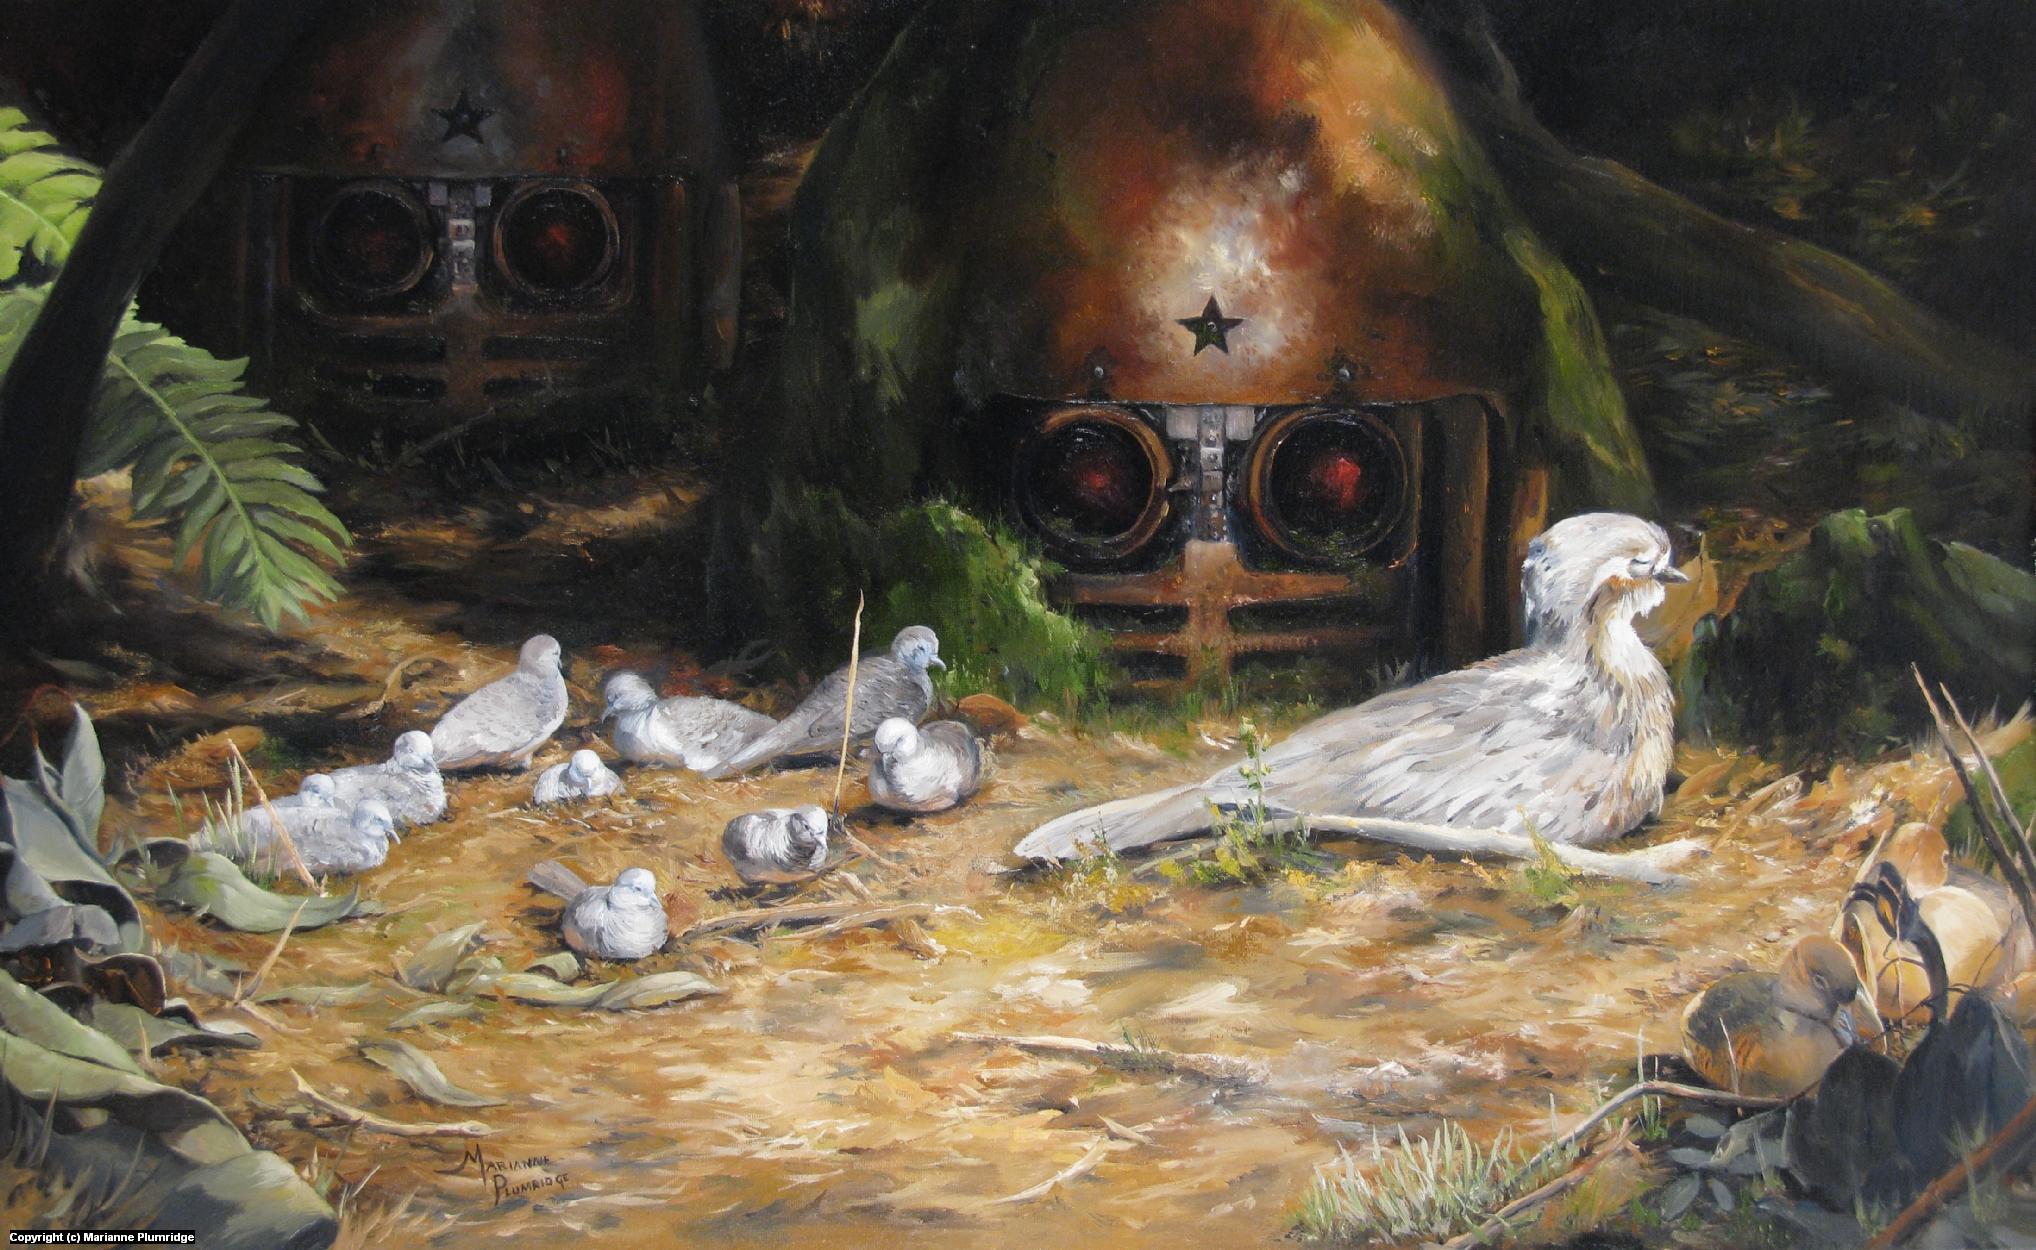 SLEEPERS Artwork by Marianne Plumridge